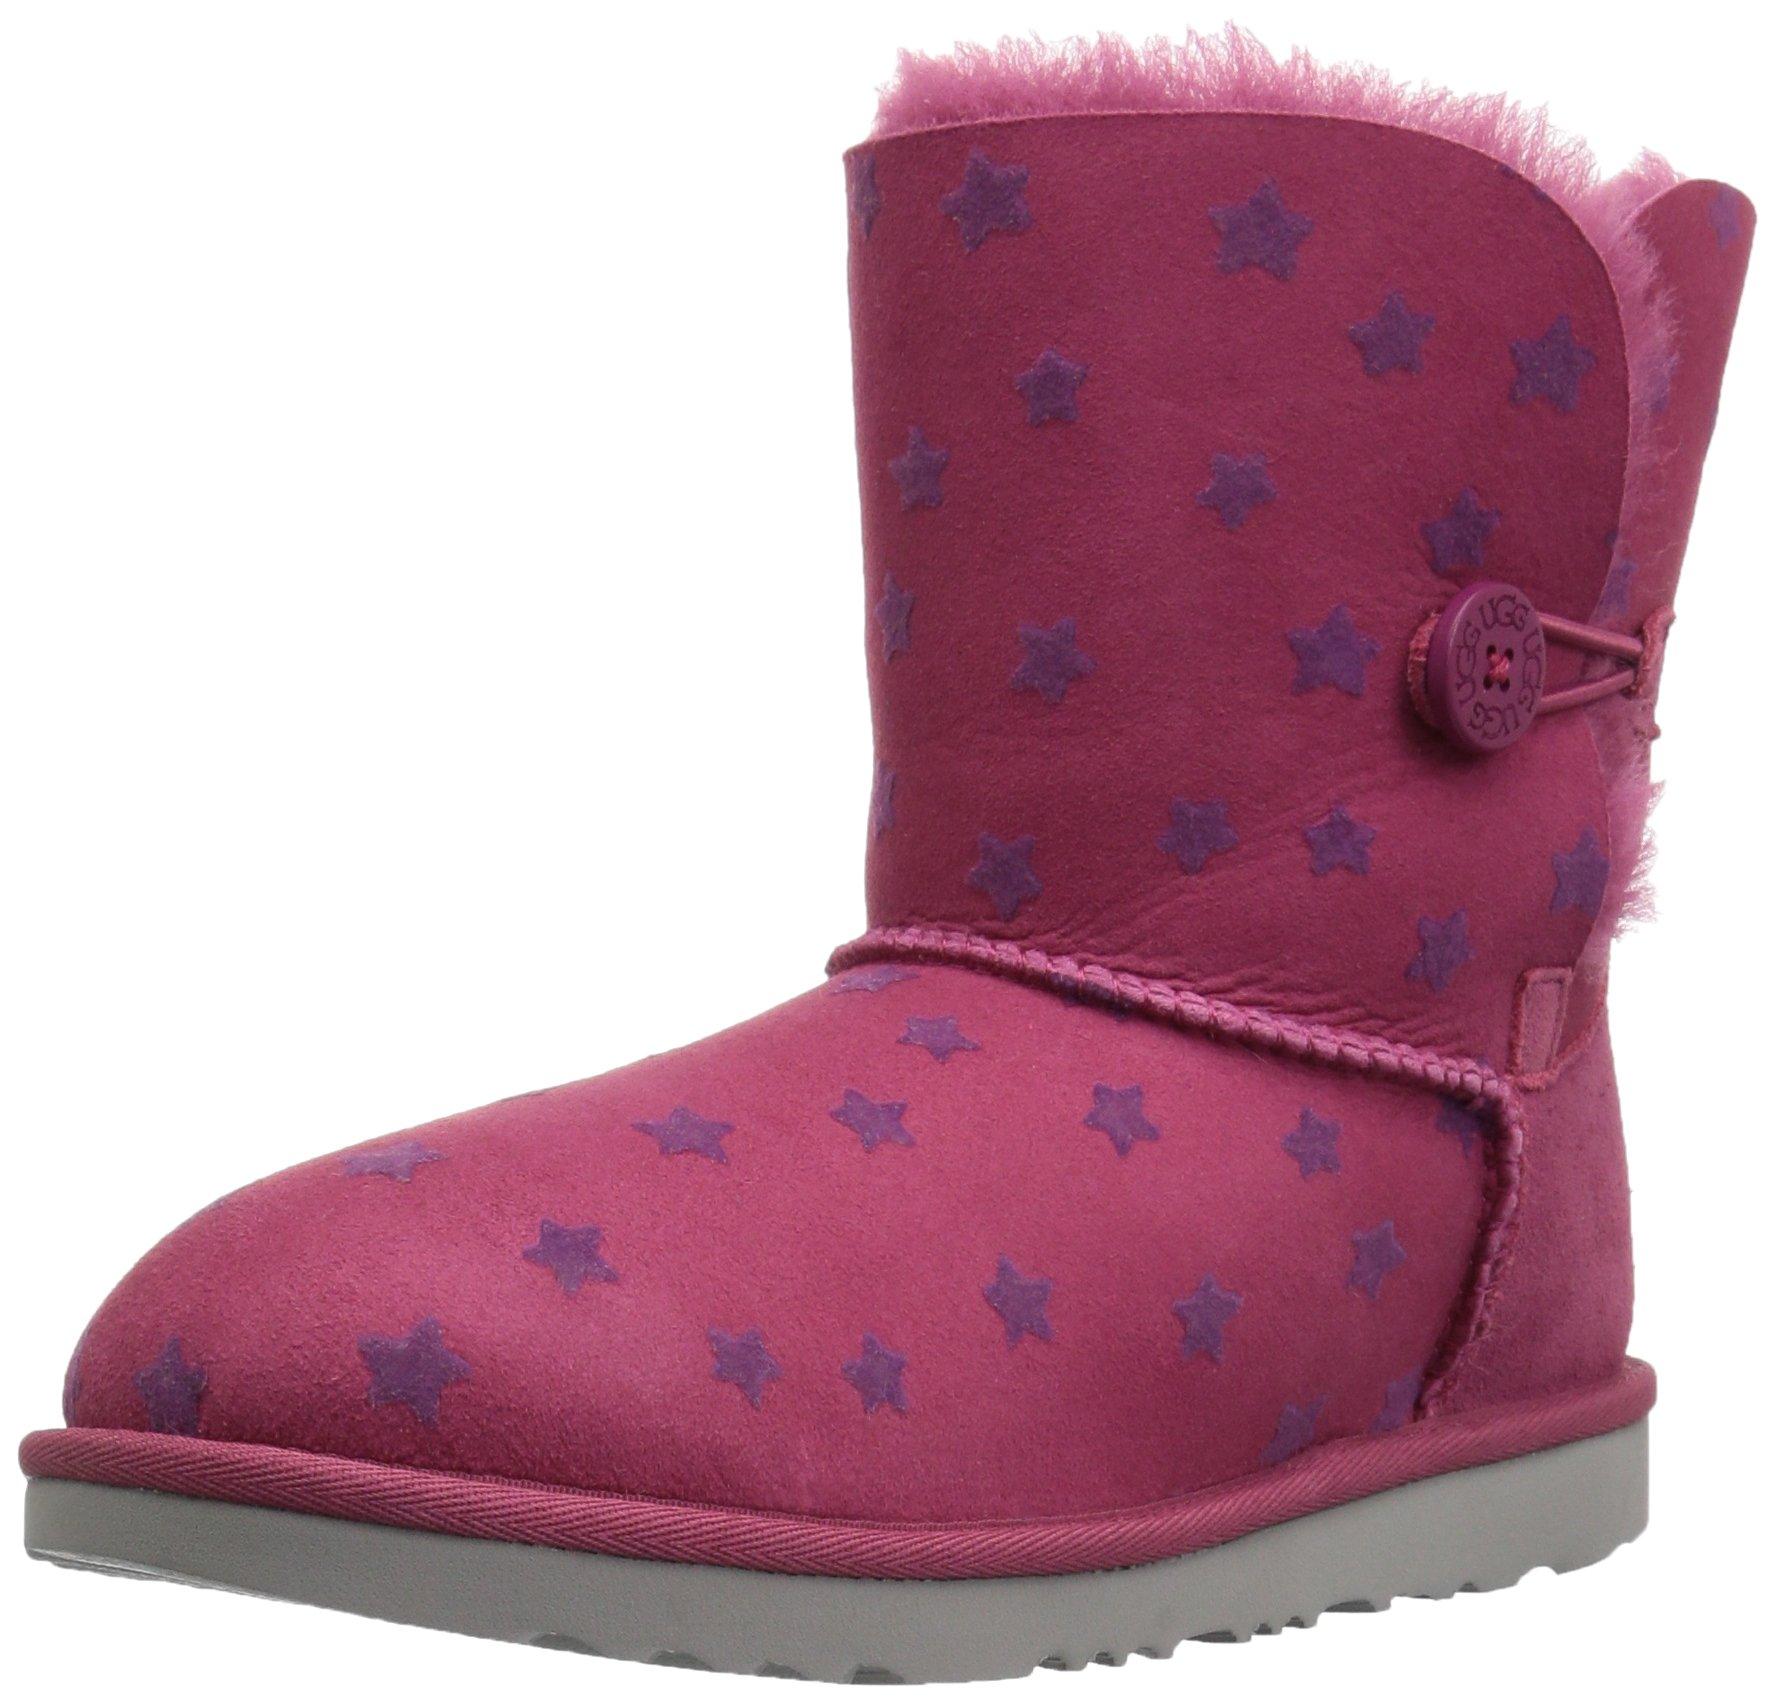 UGG Girls K Bailey Button II Stars Pull-On Boot, Brambleberry, 13 M US Little Kid